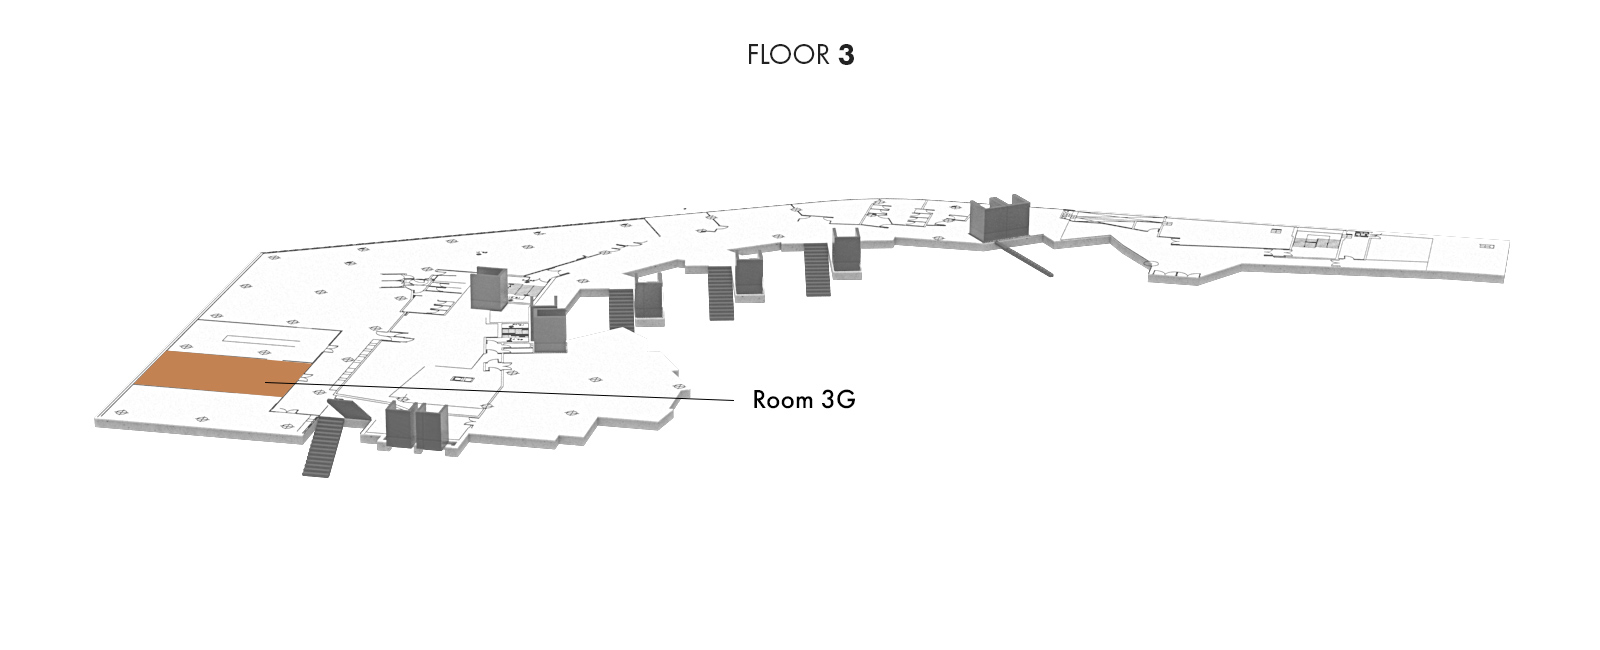 Room 3G, Floor 3 | Palacio Euskalduna Jauregia